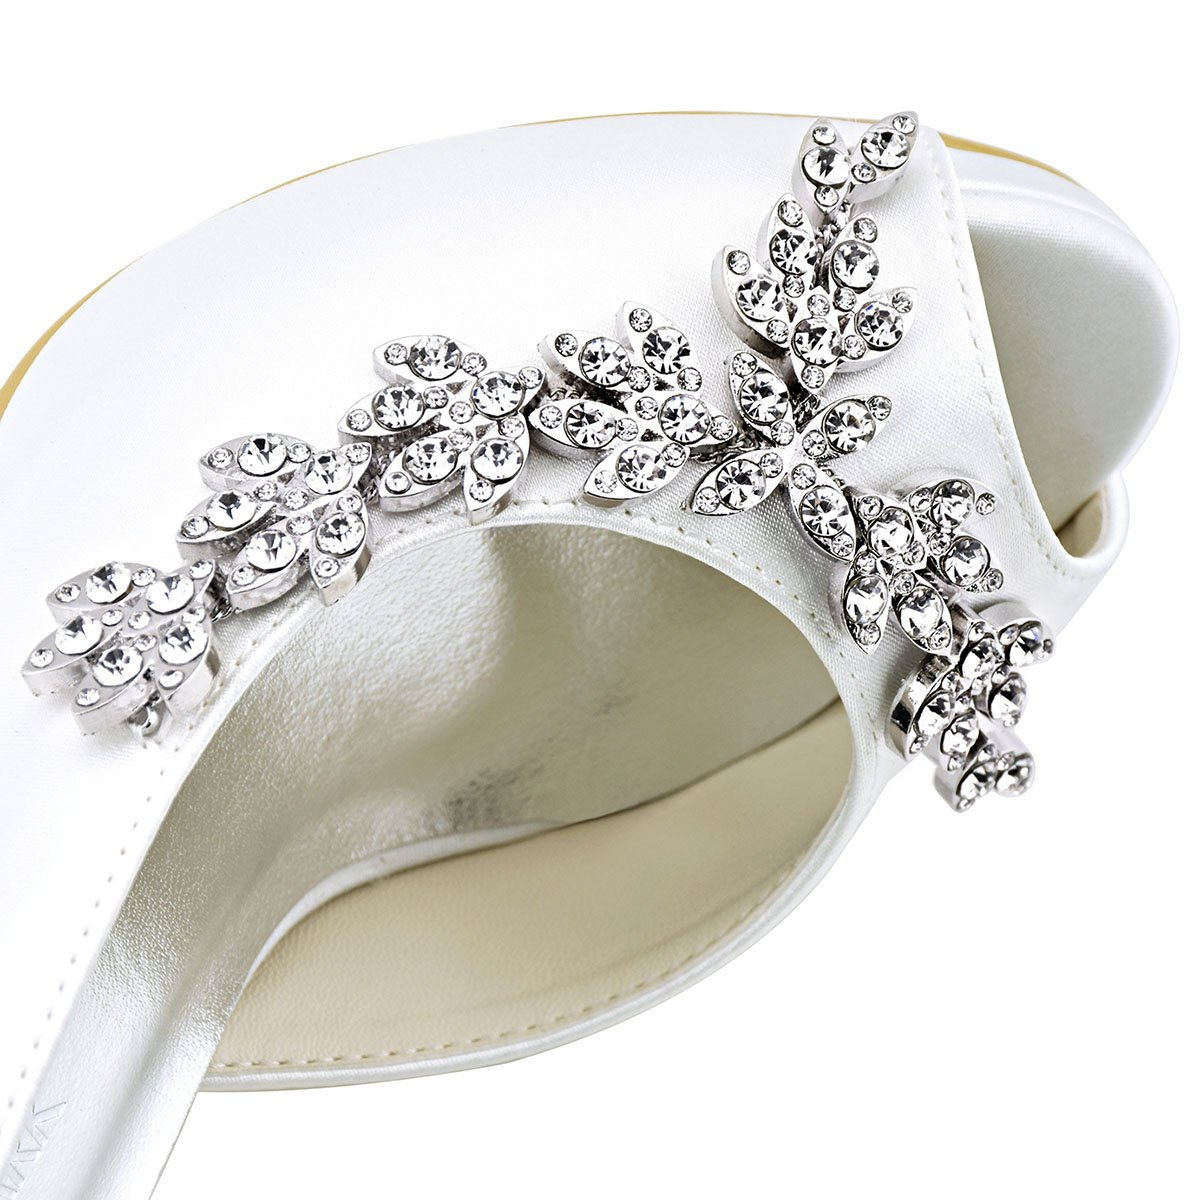 ElegantPark Women's Peep Toe Platform High Prom Heel Rhinestones Satin Evening Prom High Wedding Shoes B018THY9H0 8 B(M) US|White 31b951